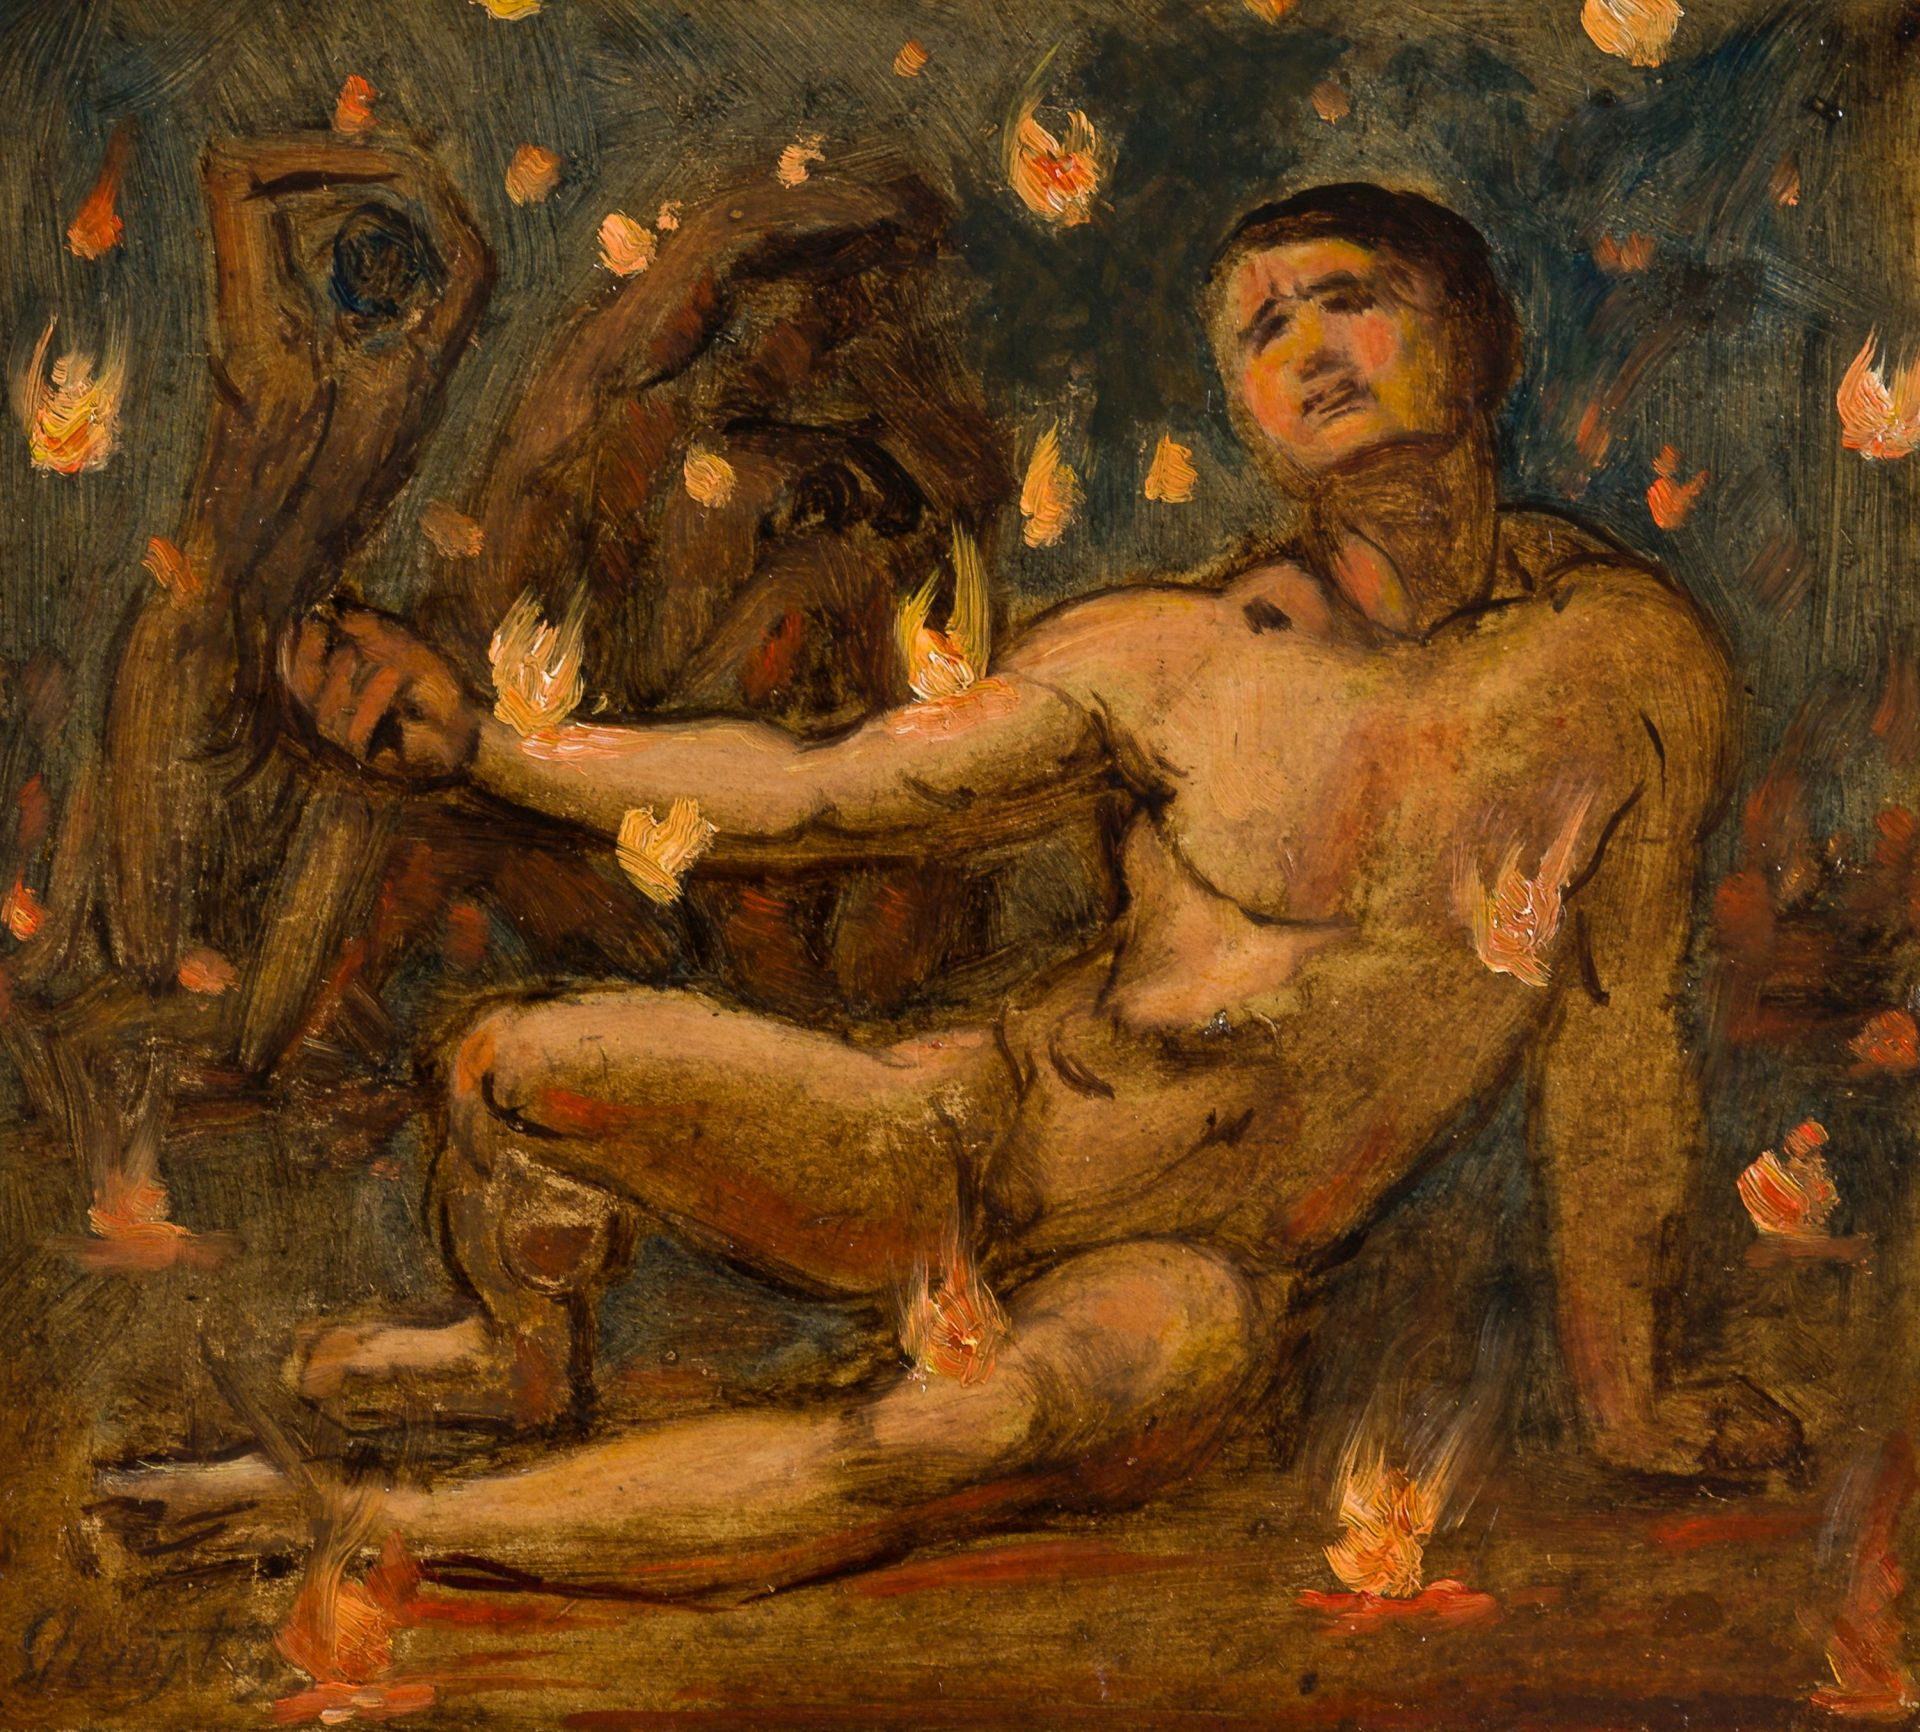 Max Slevogt-In Purgatory